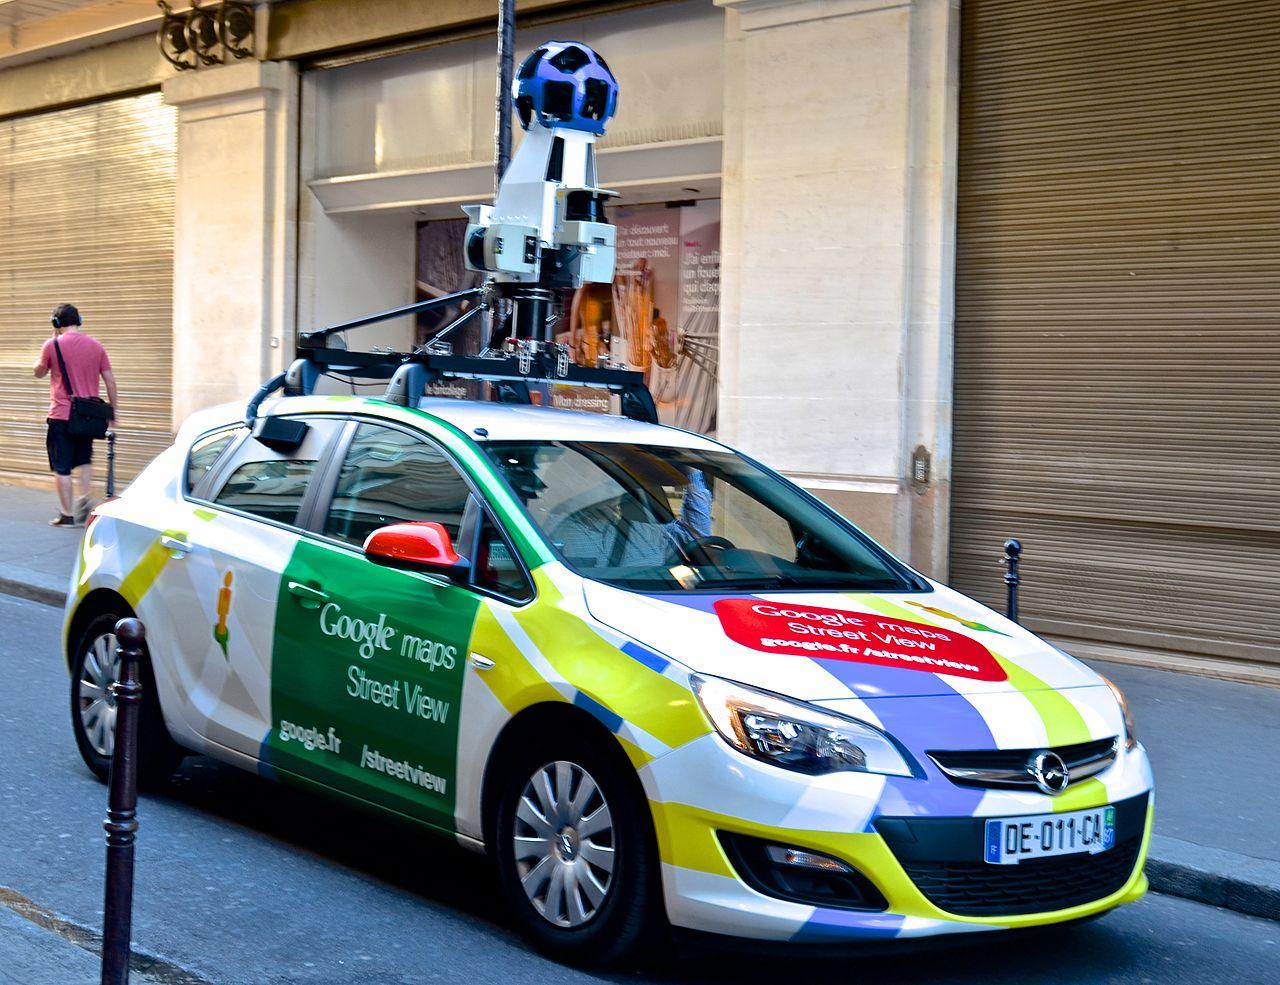 File:Google maps car, Paris May 2014.jpg - Wikimedia Commons